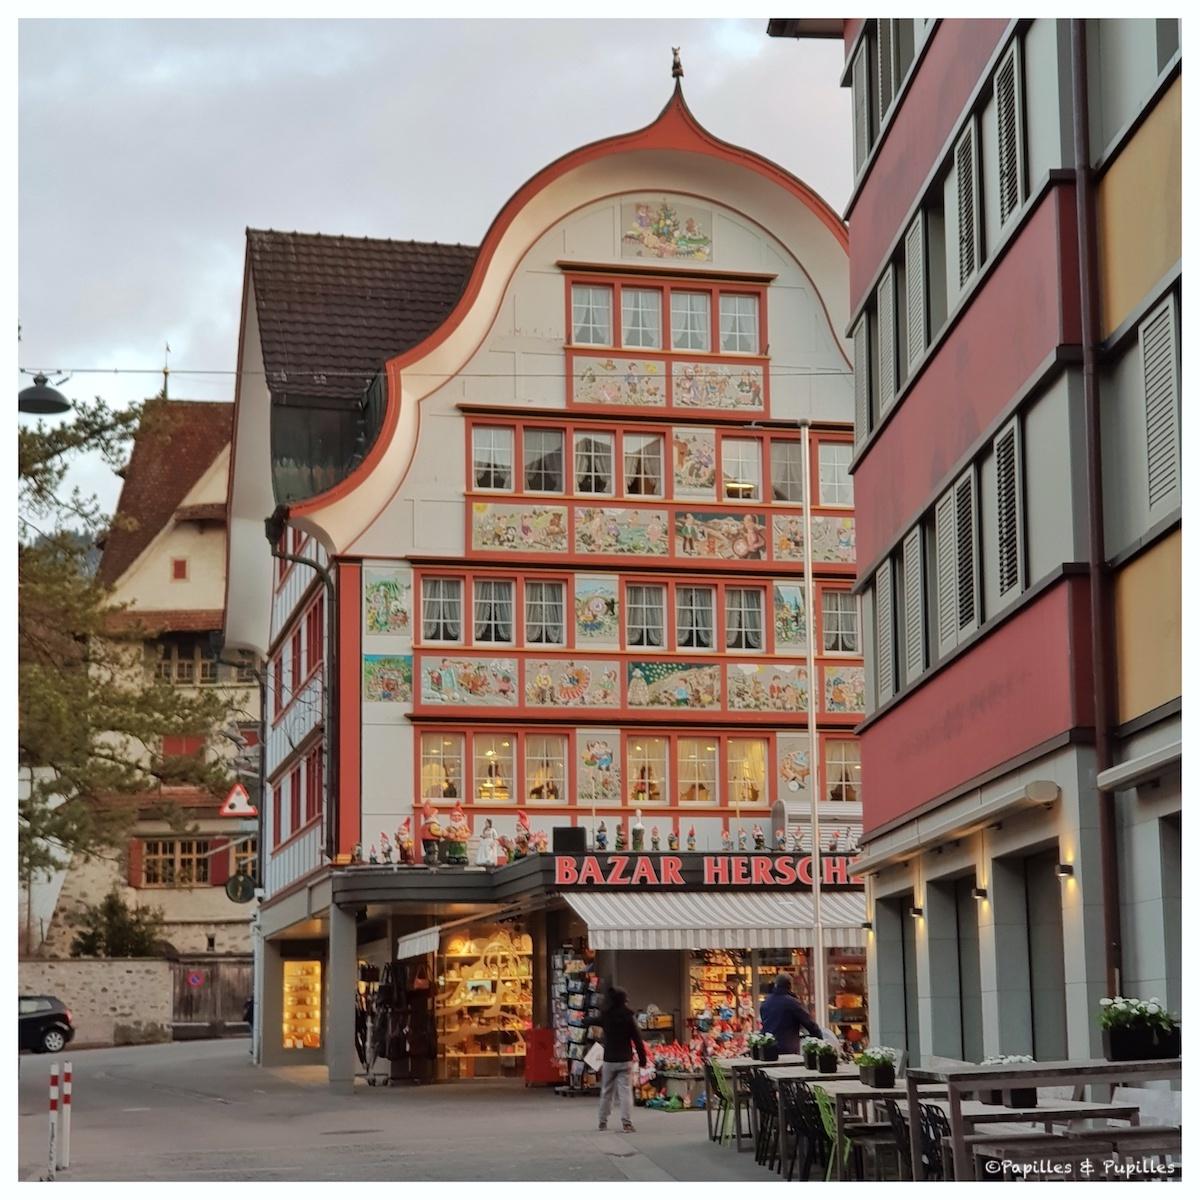 Le bazar d'Appenzell